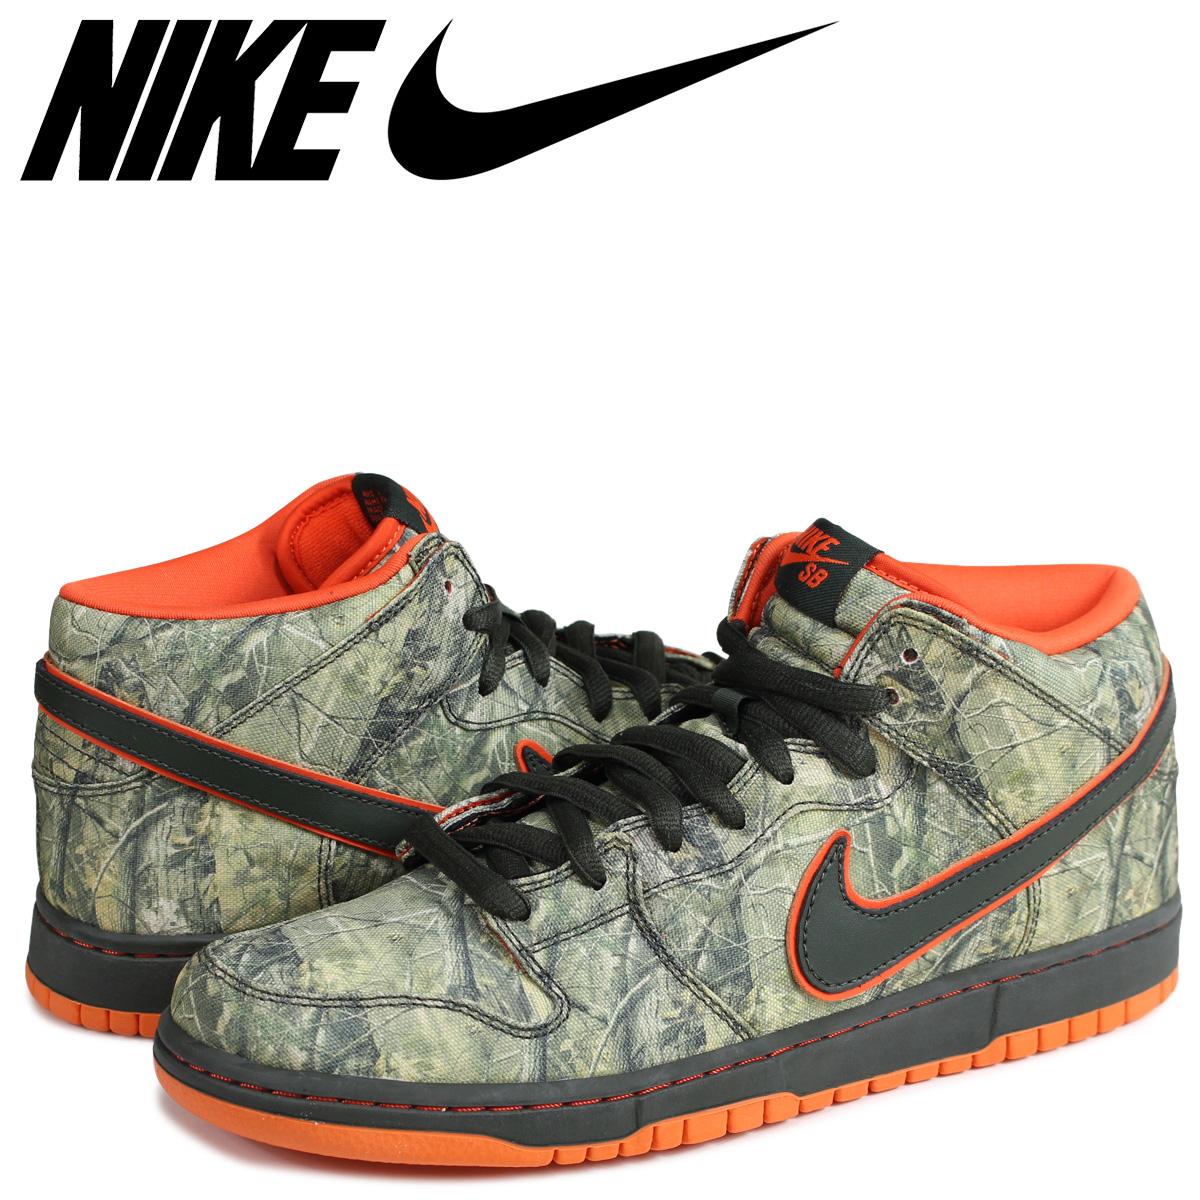 finest selection 187ce b50db NIKE SB DUNK MID PREMIUM REALTREECAMO Nike dunk sneakers 314,381-300 green  ...